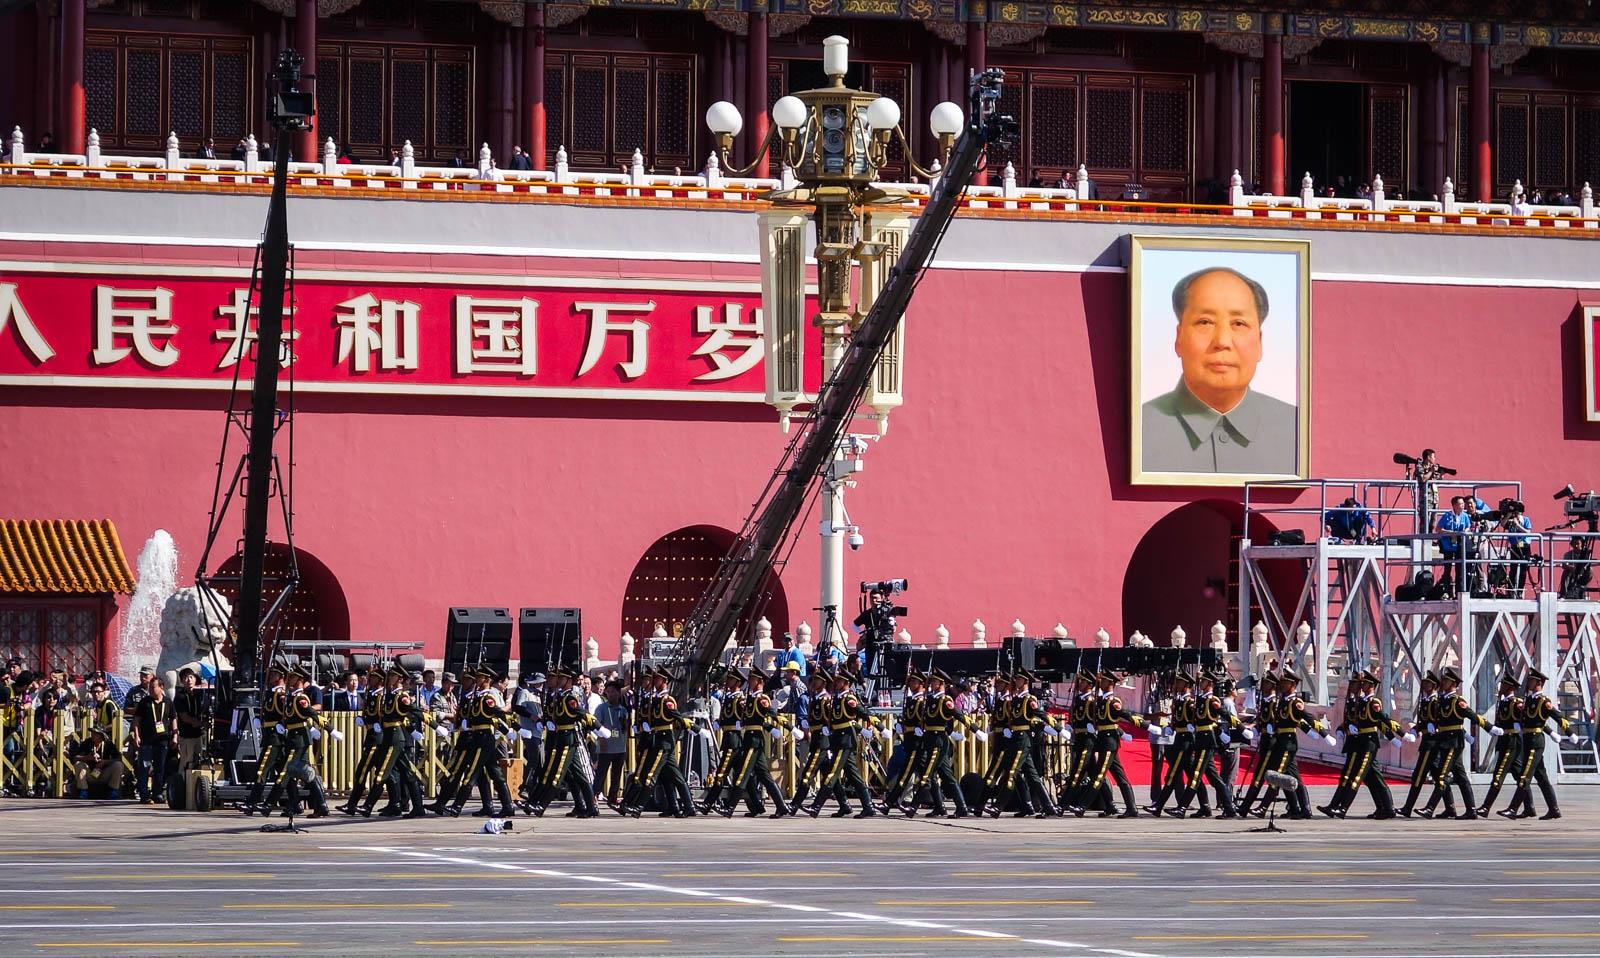 beijing-china-military-parade-2015-10